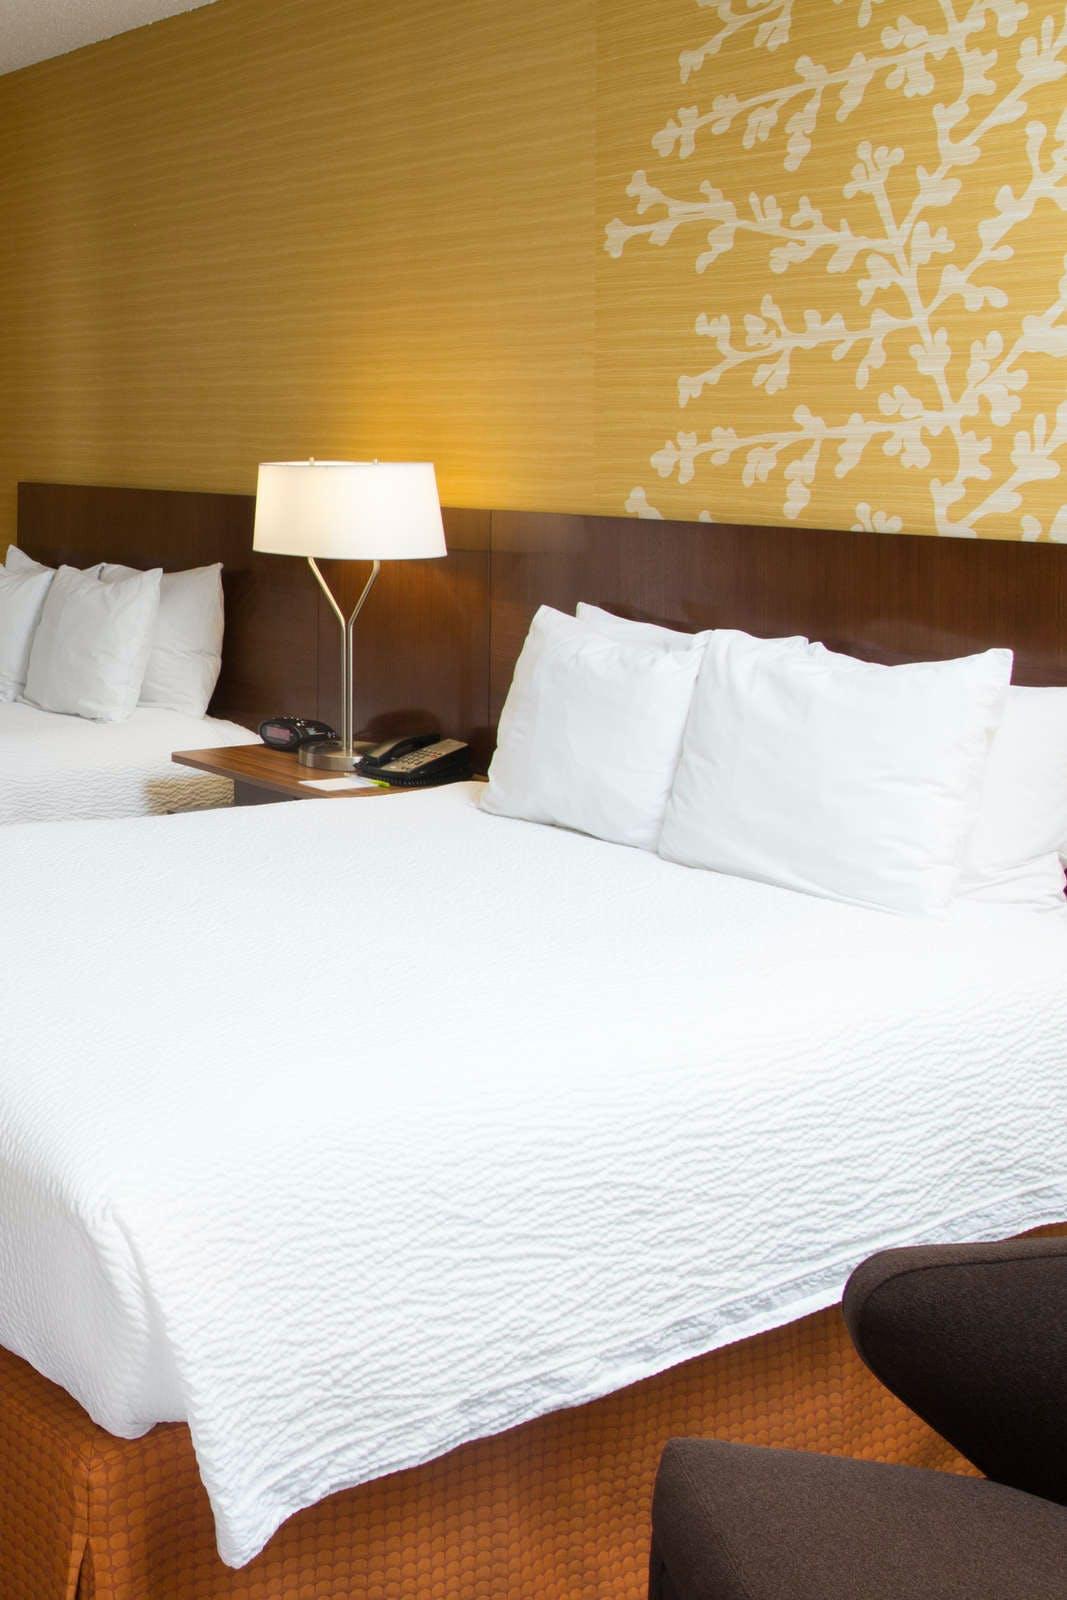 Fairfield Inn and Suites Anaheim Hills